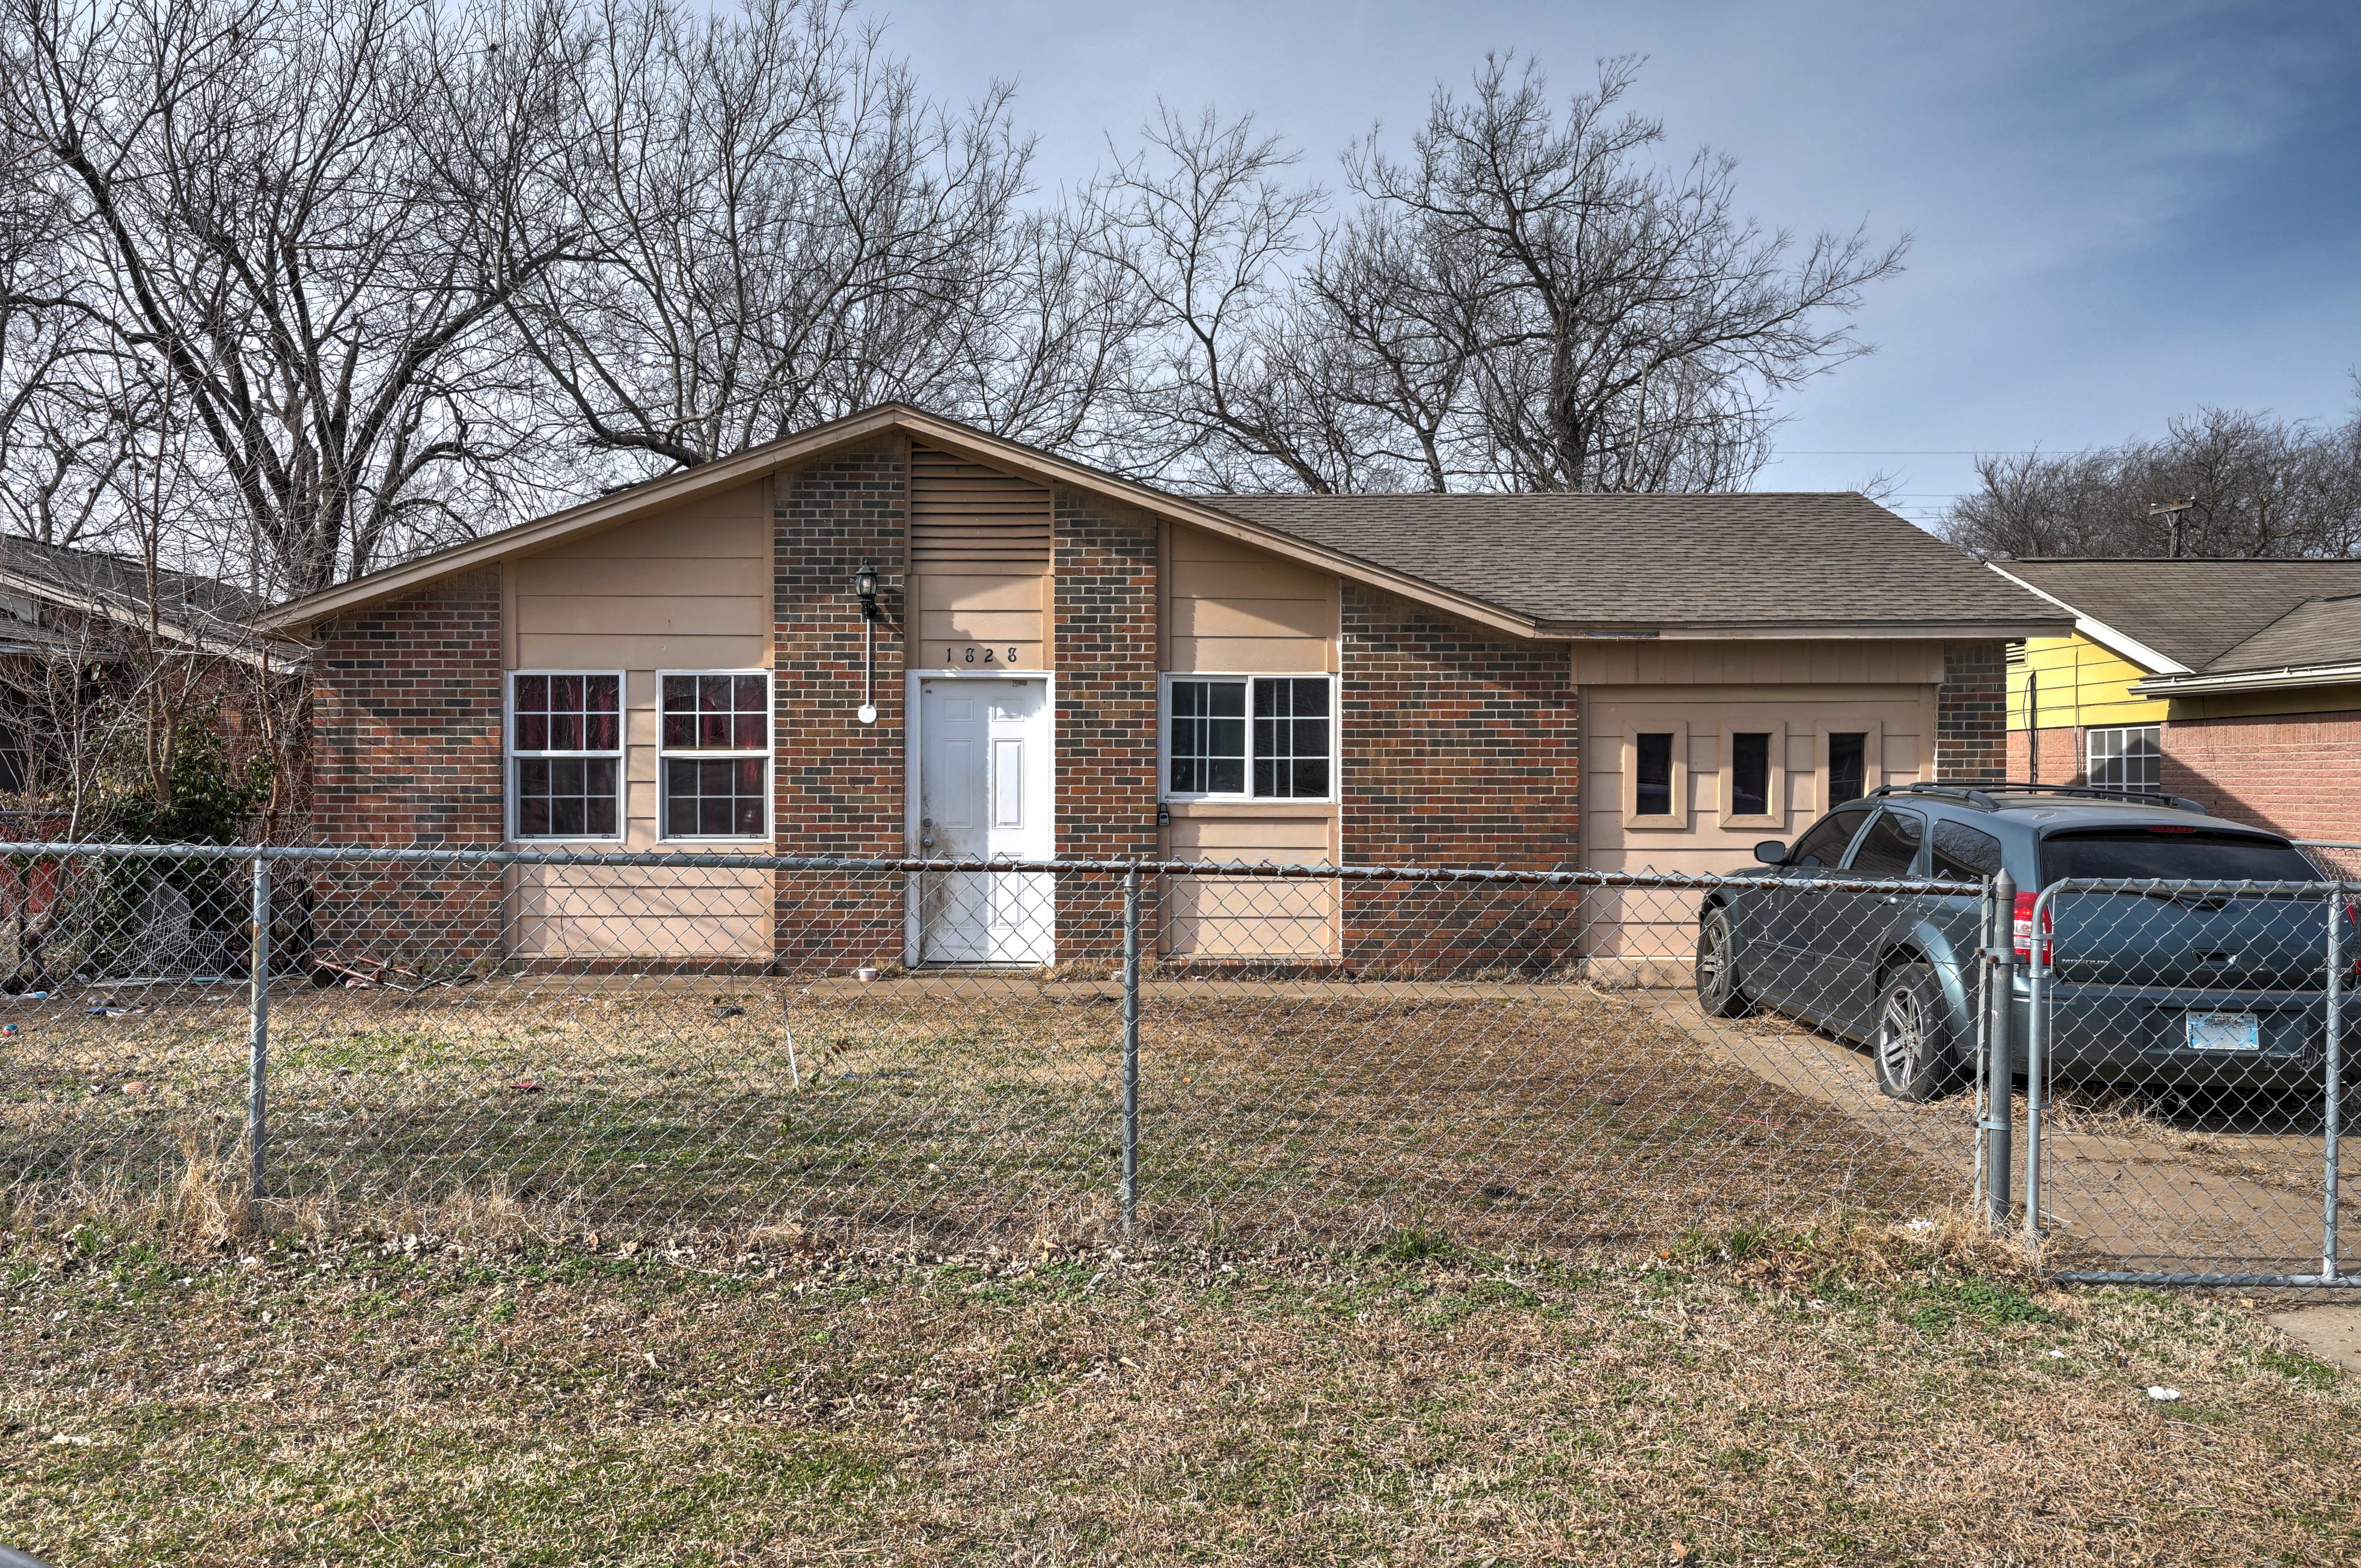 1828 N Quaker Avenue Property Photo 1